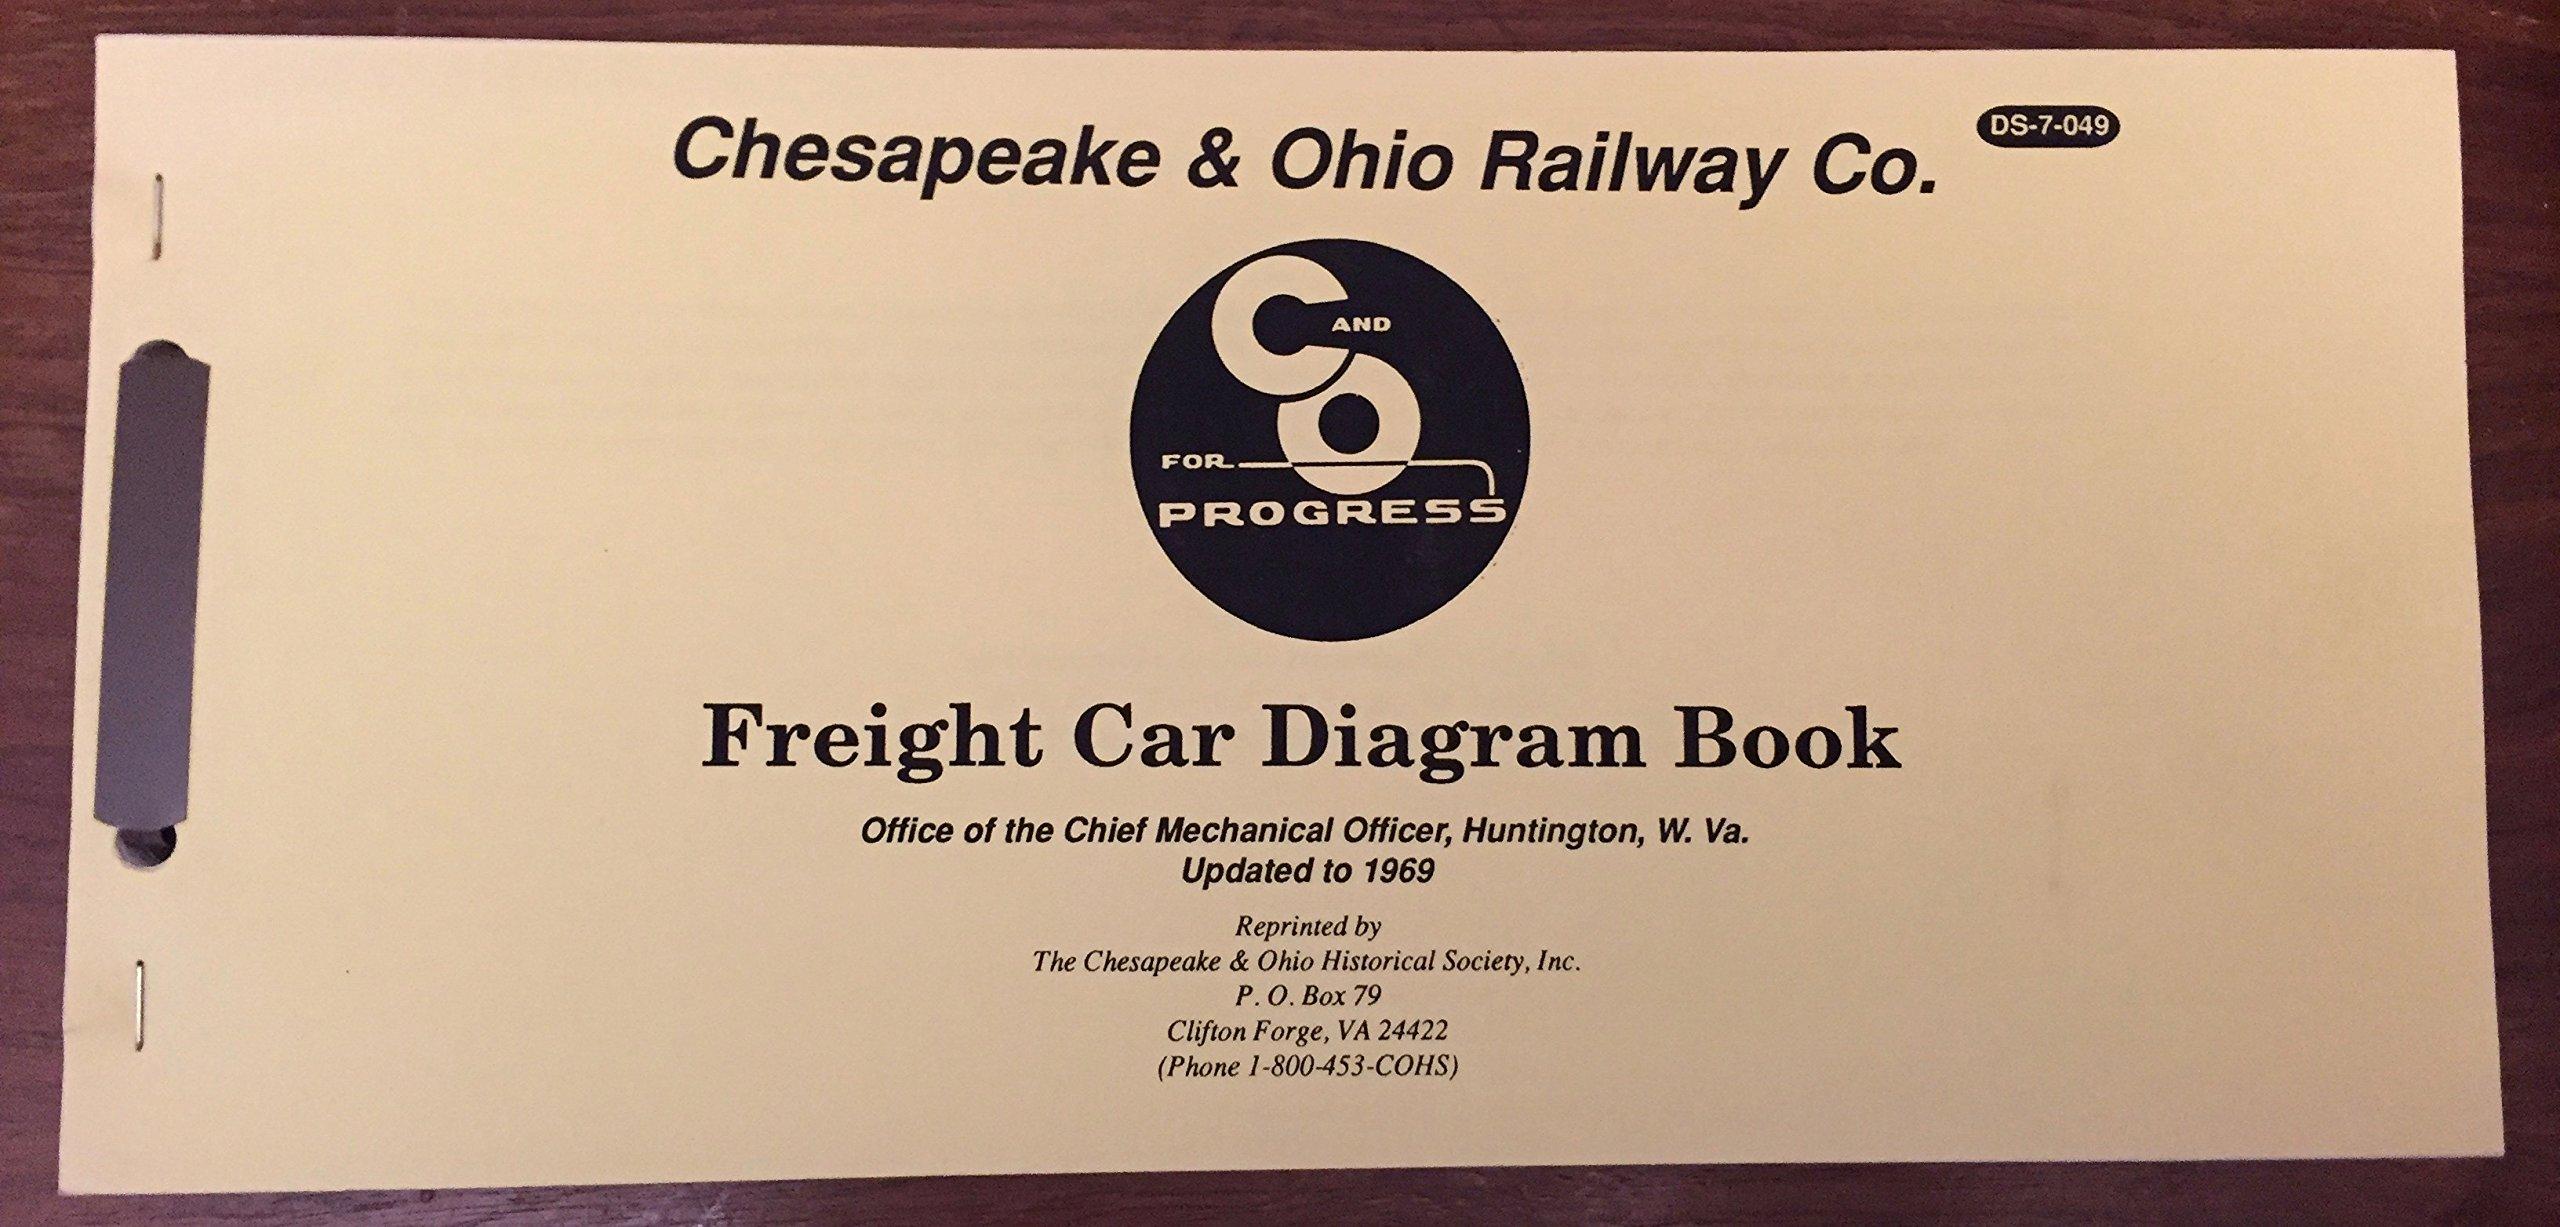 Chesapeake & Ohio Railway Freight Car Diagram Book Updated